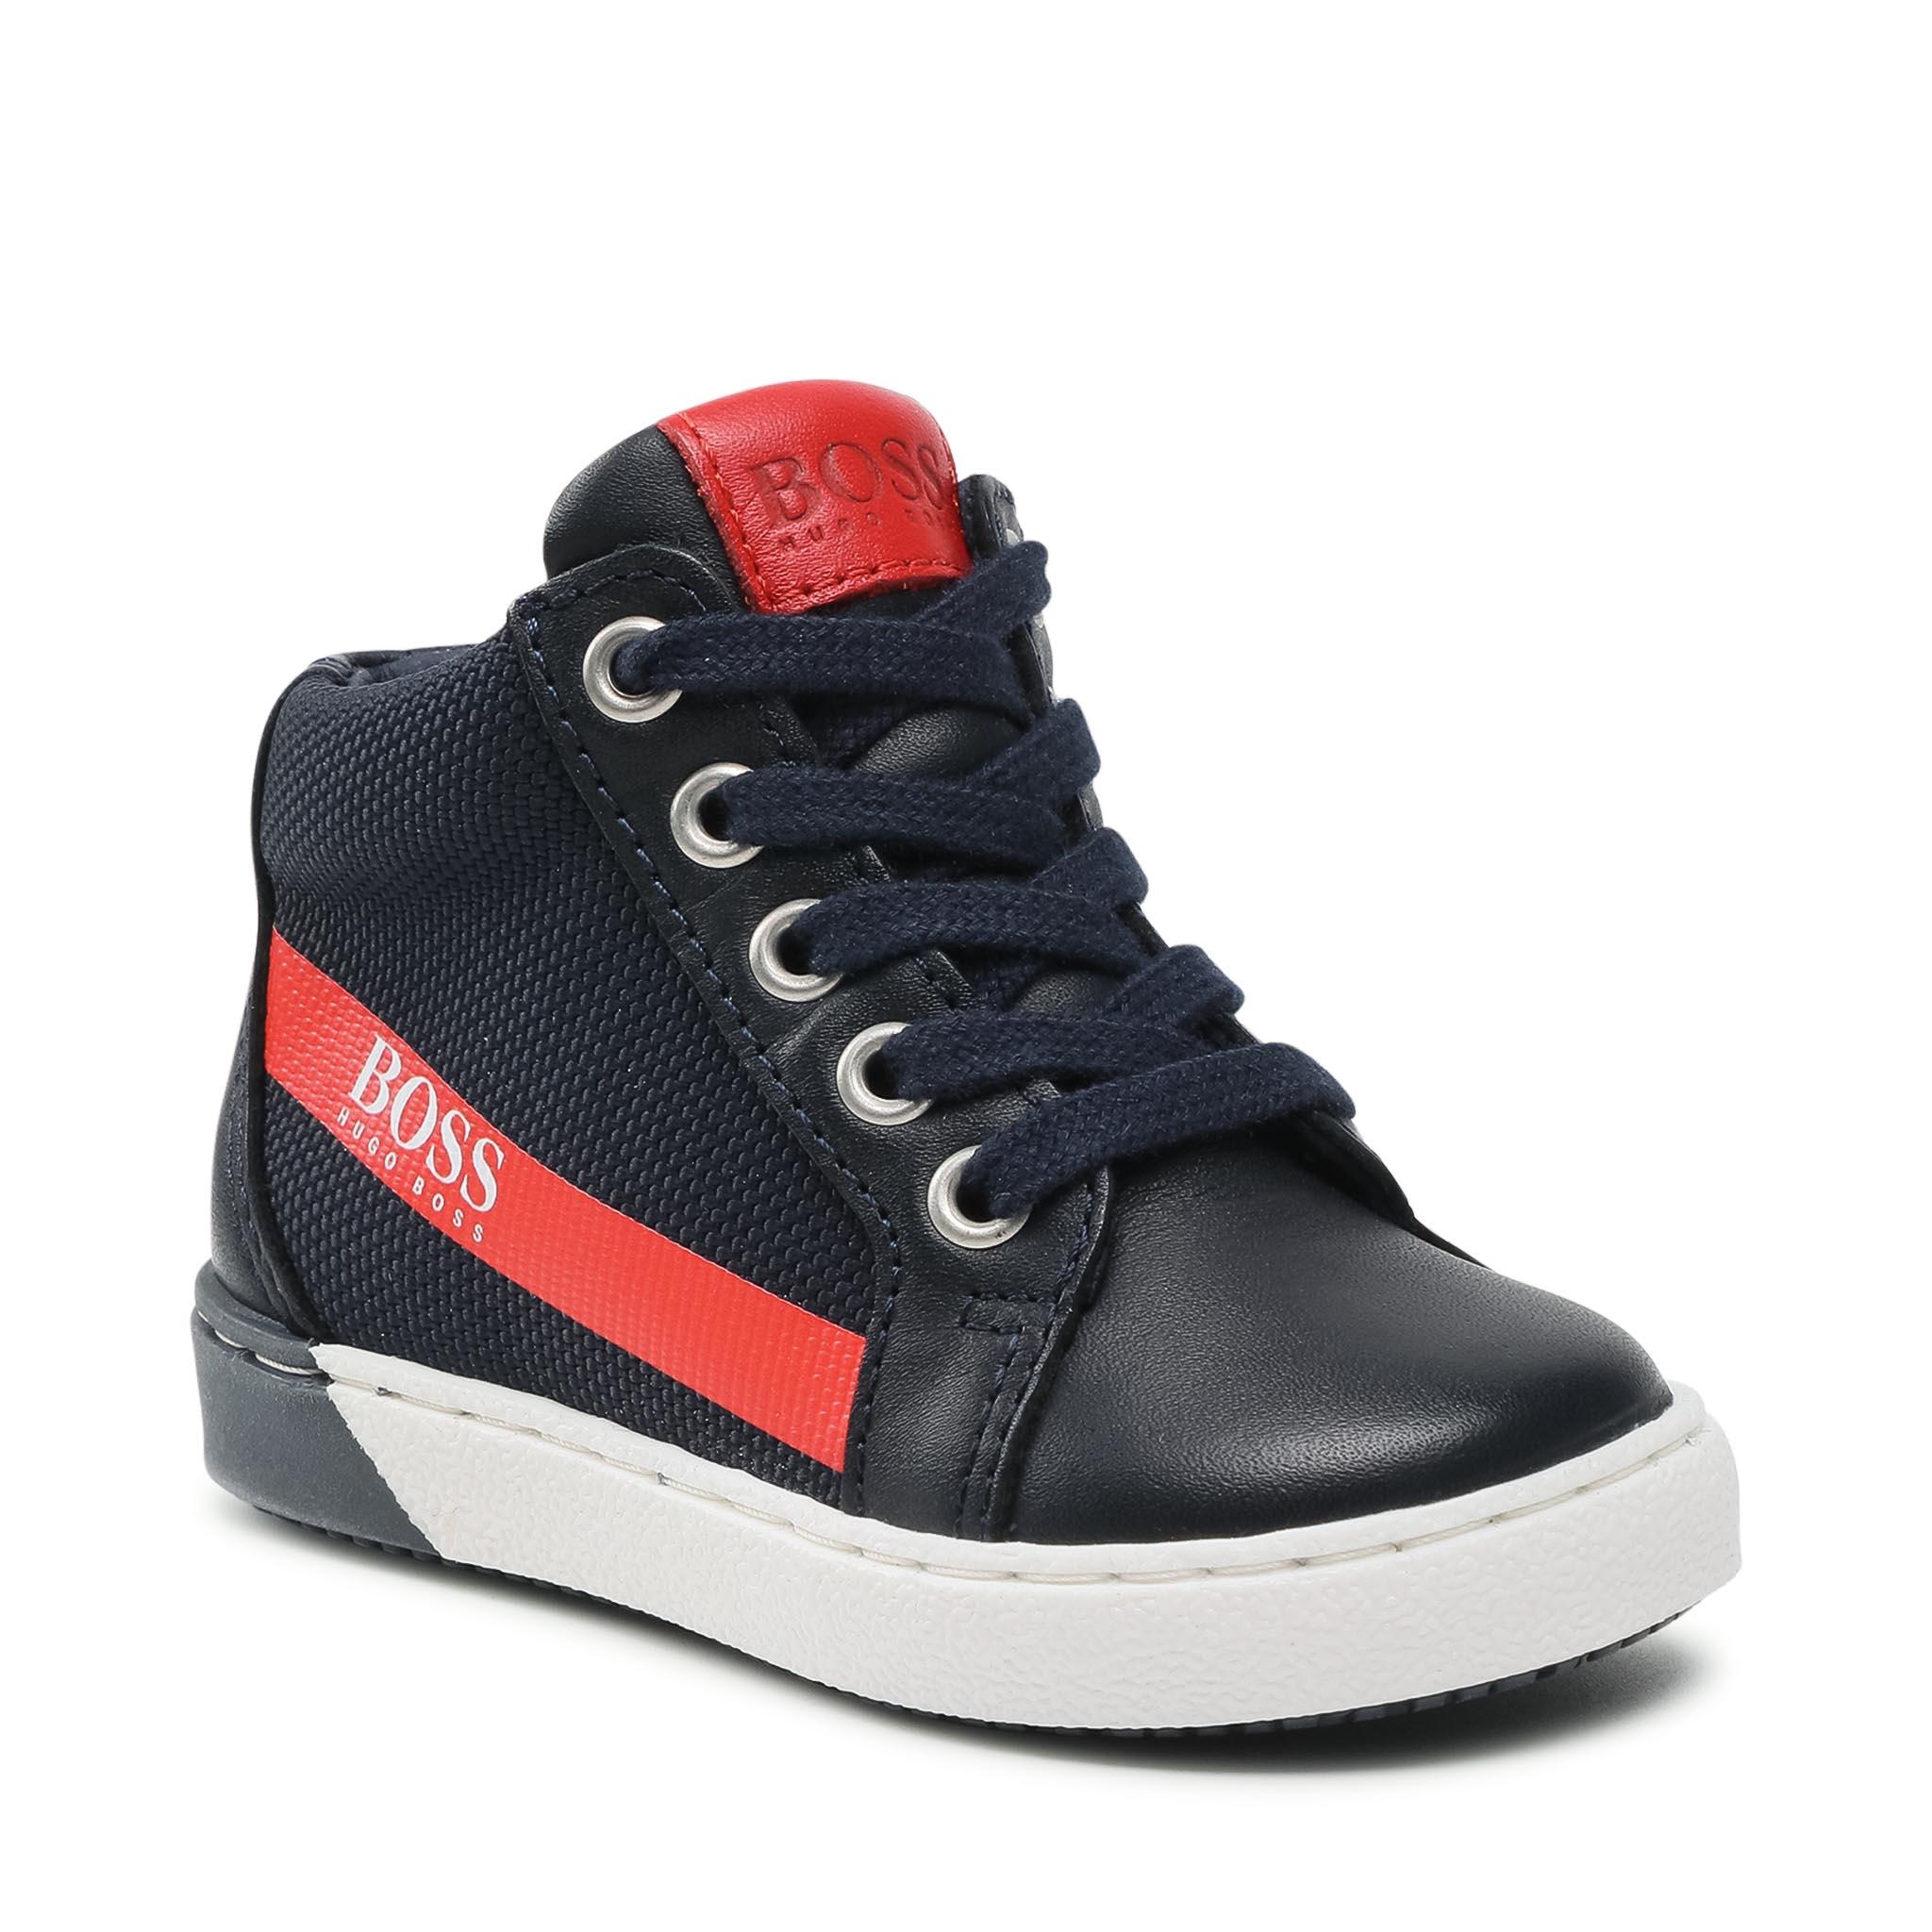 Sneakers BOSS - J09162 S Navy 849